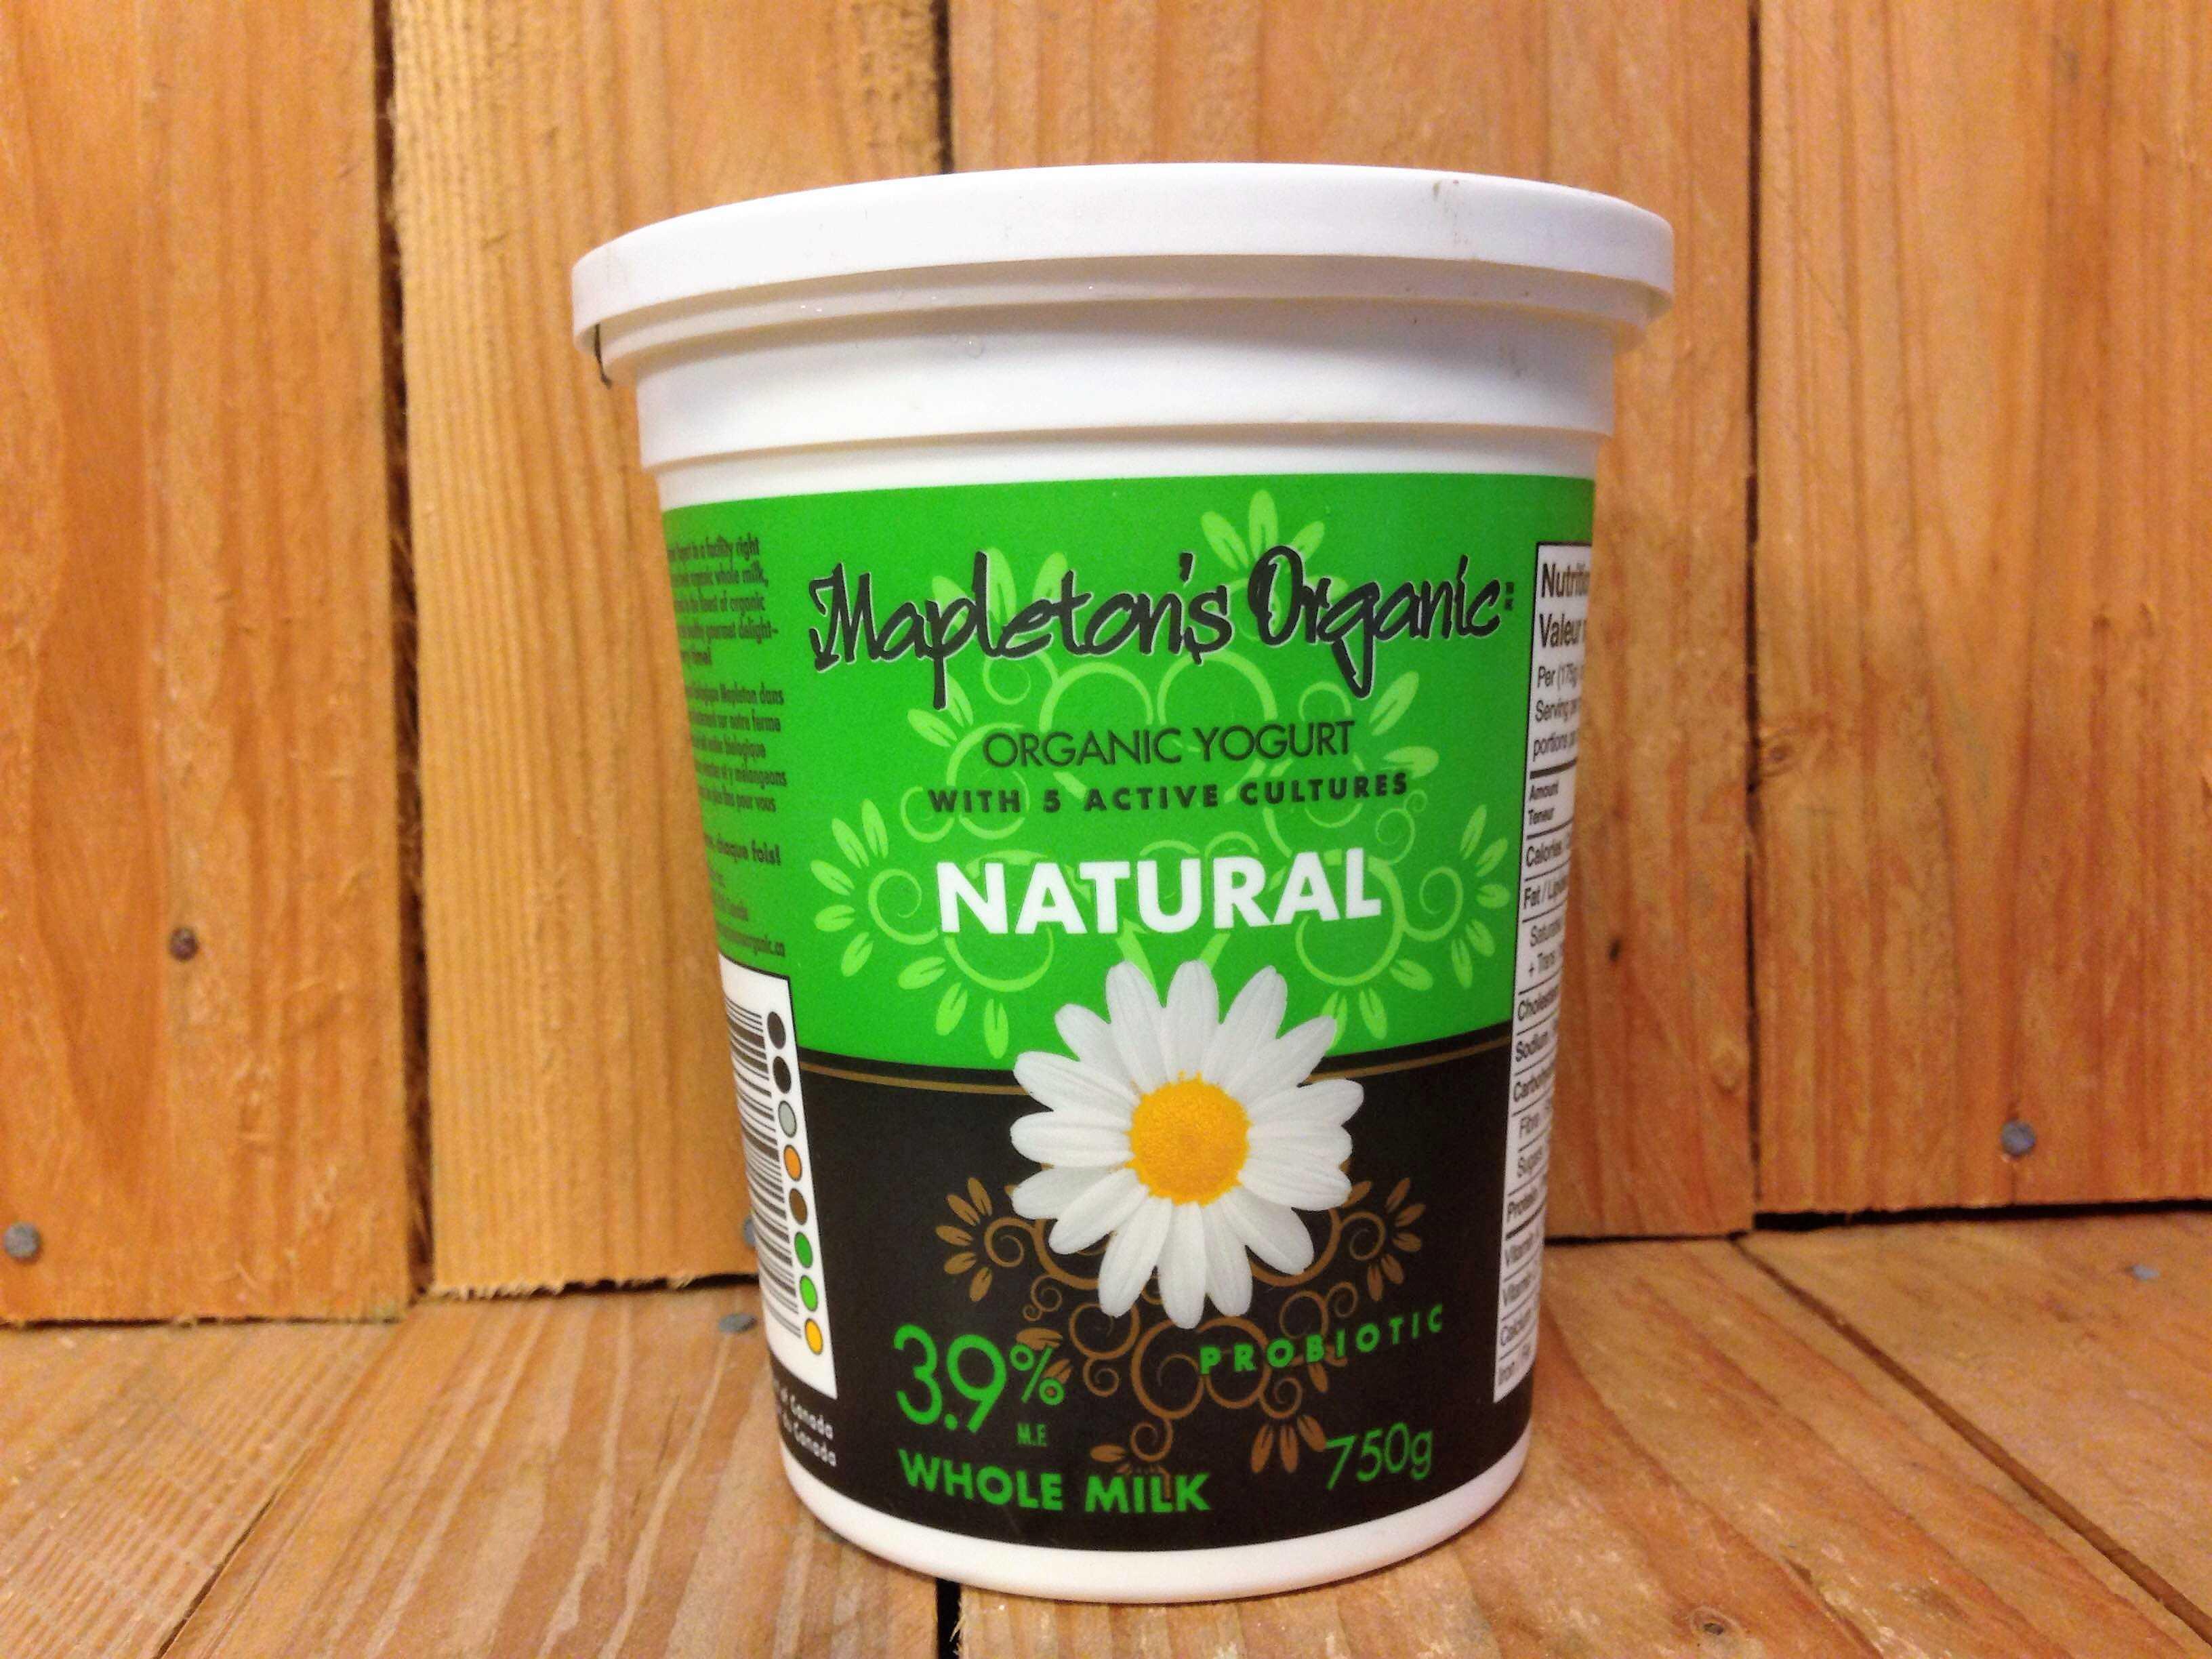 Mapleton Dairy – 3.9% WHOLE Milk  Natural Yogurt (750g)